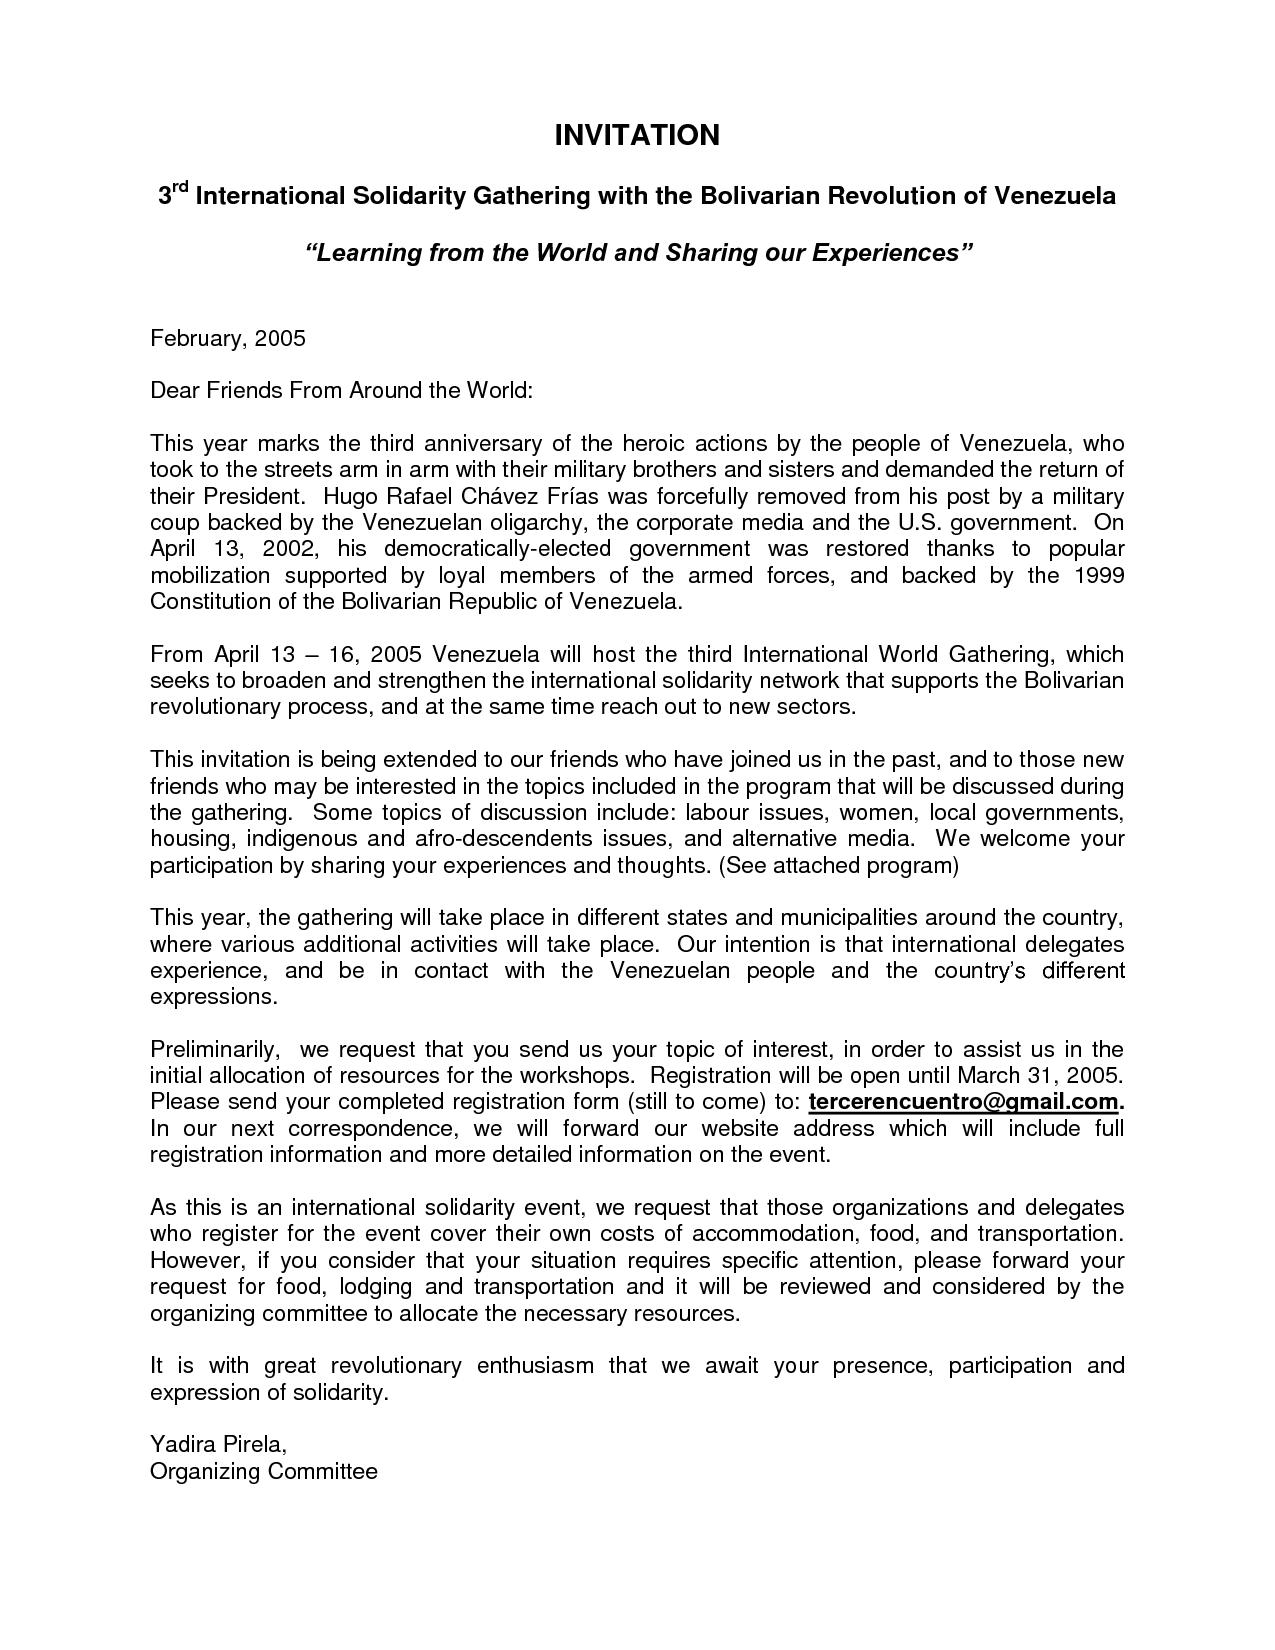 Invitation For Anniversary Of The Company